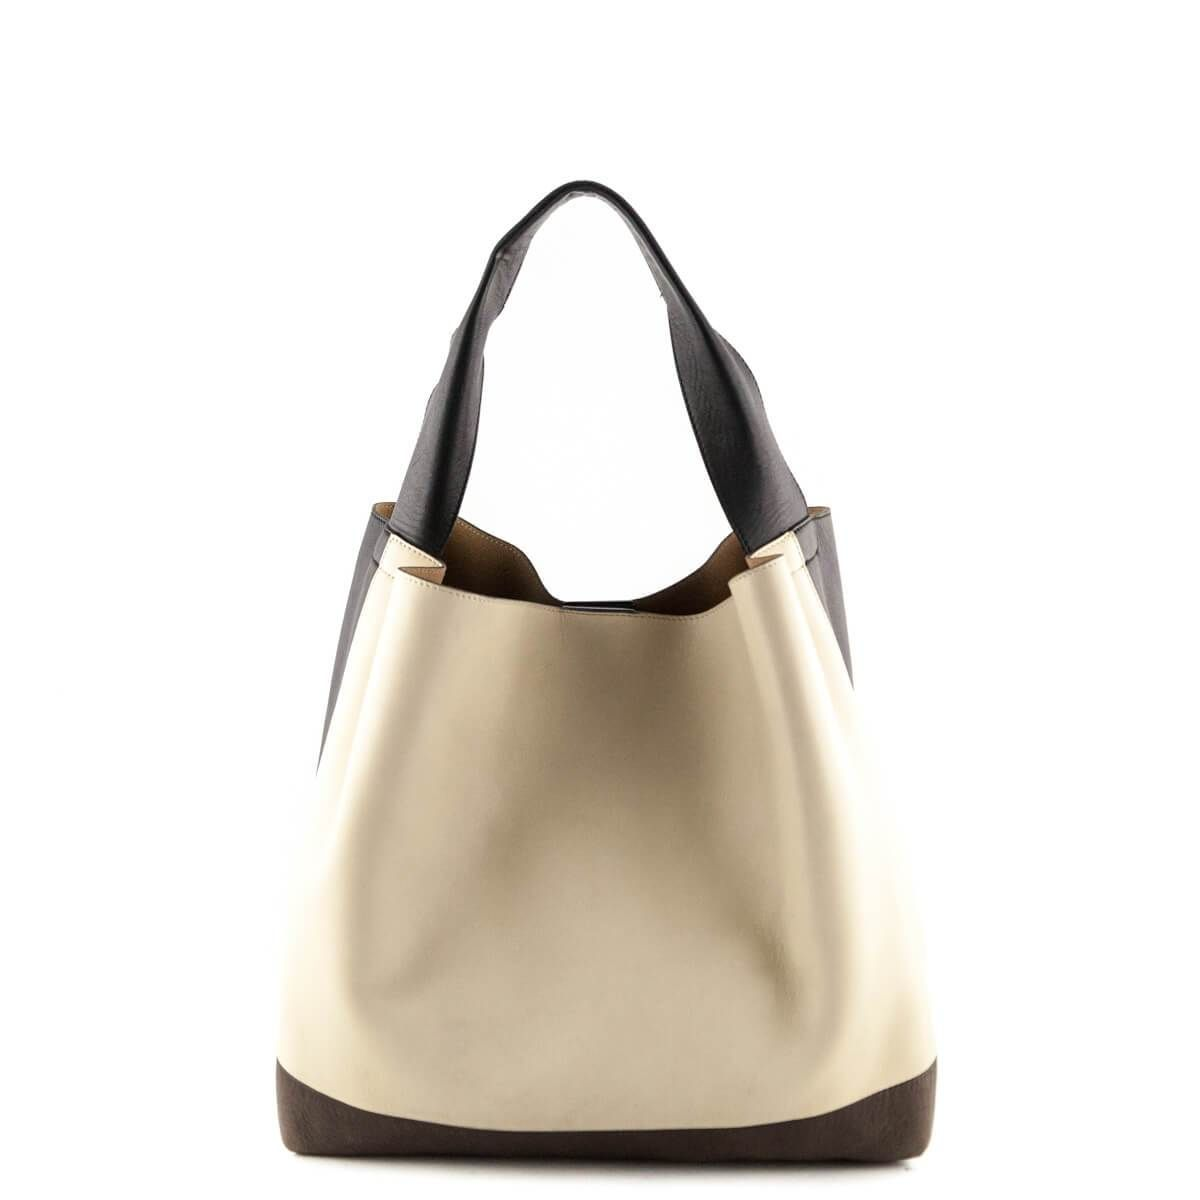 5b5b997ac873 Marni Color Block Lambskin Leather Tote - LOVE that BAG - Preowned  Authentic Designer Handbags